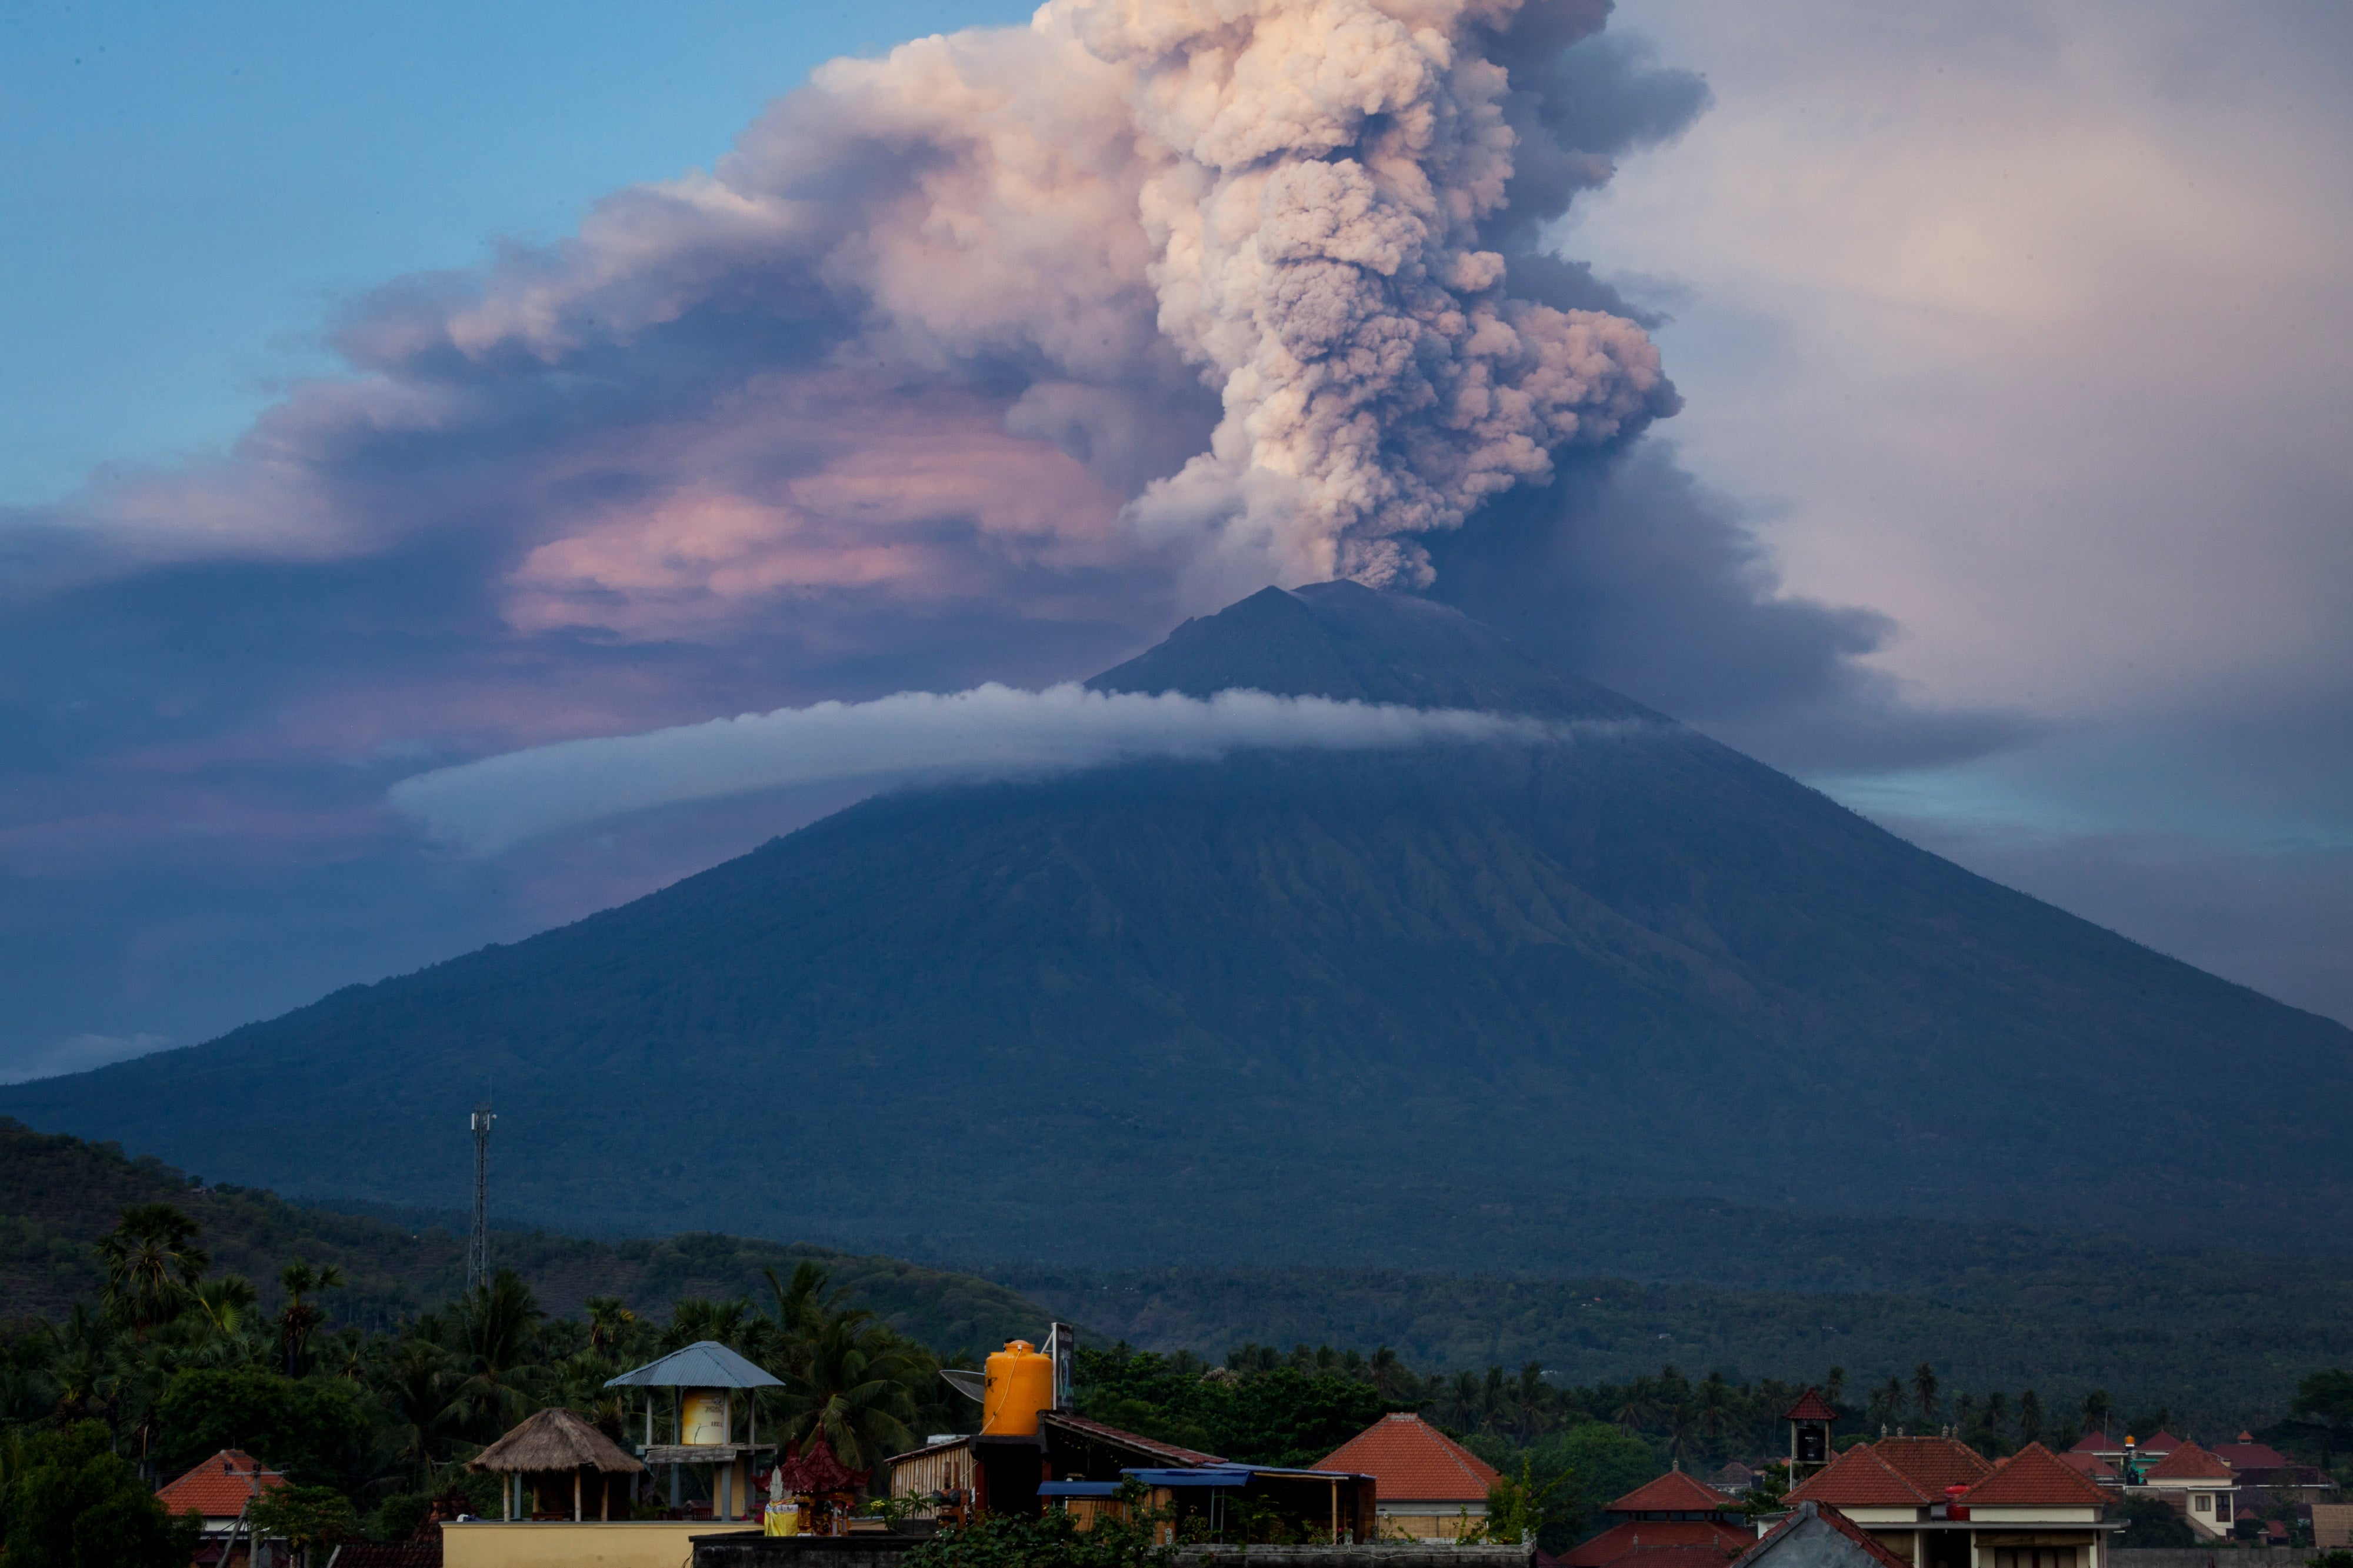 Scientists Watch and Wait as Balis Menacing Volcano Rumbles